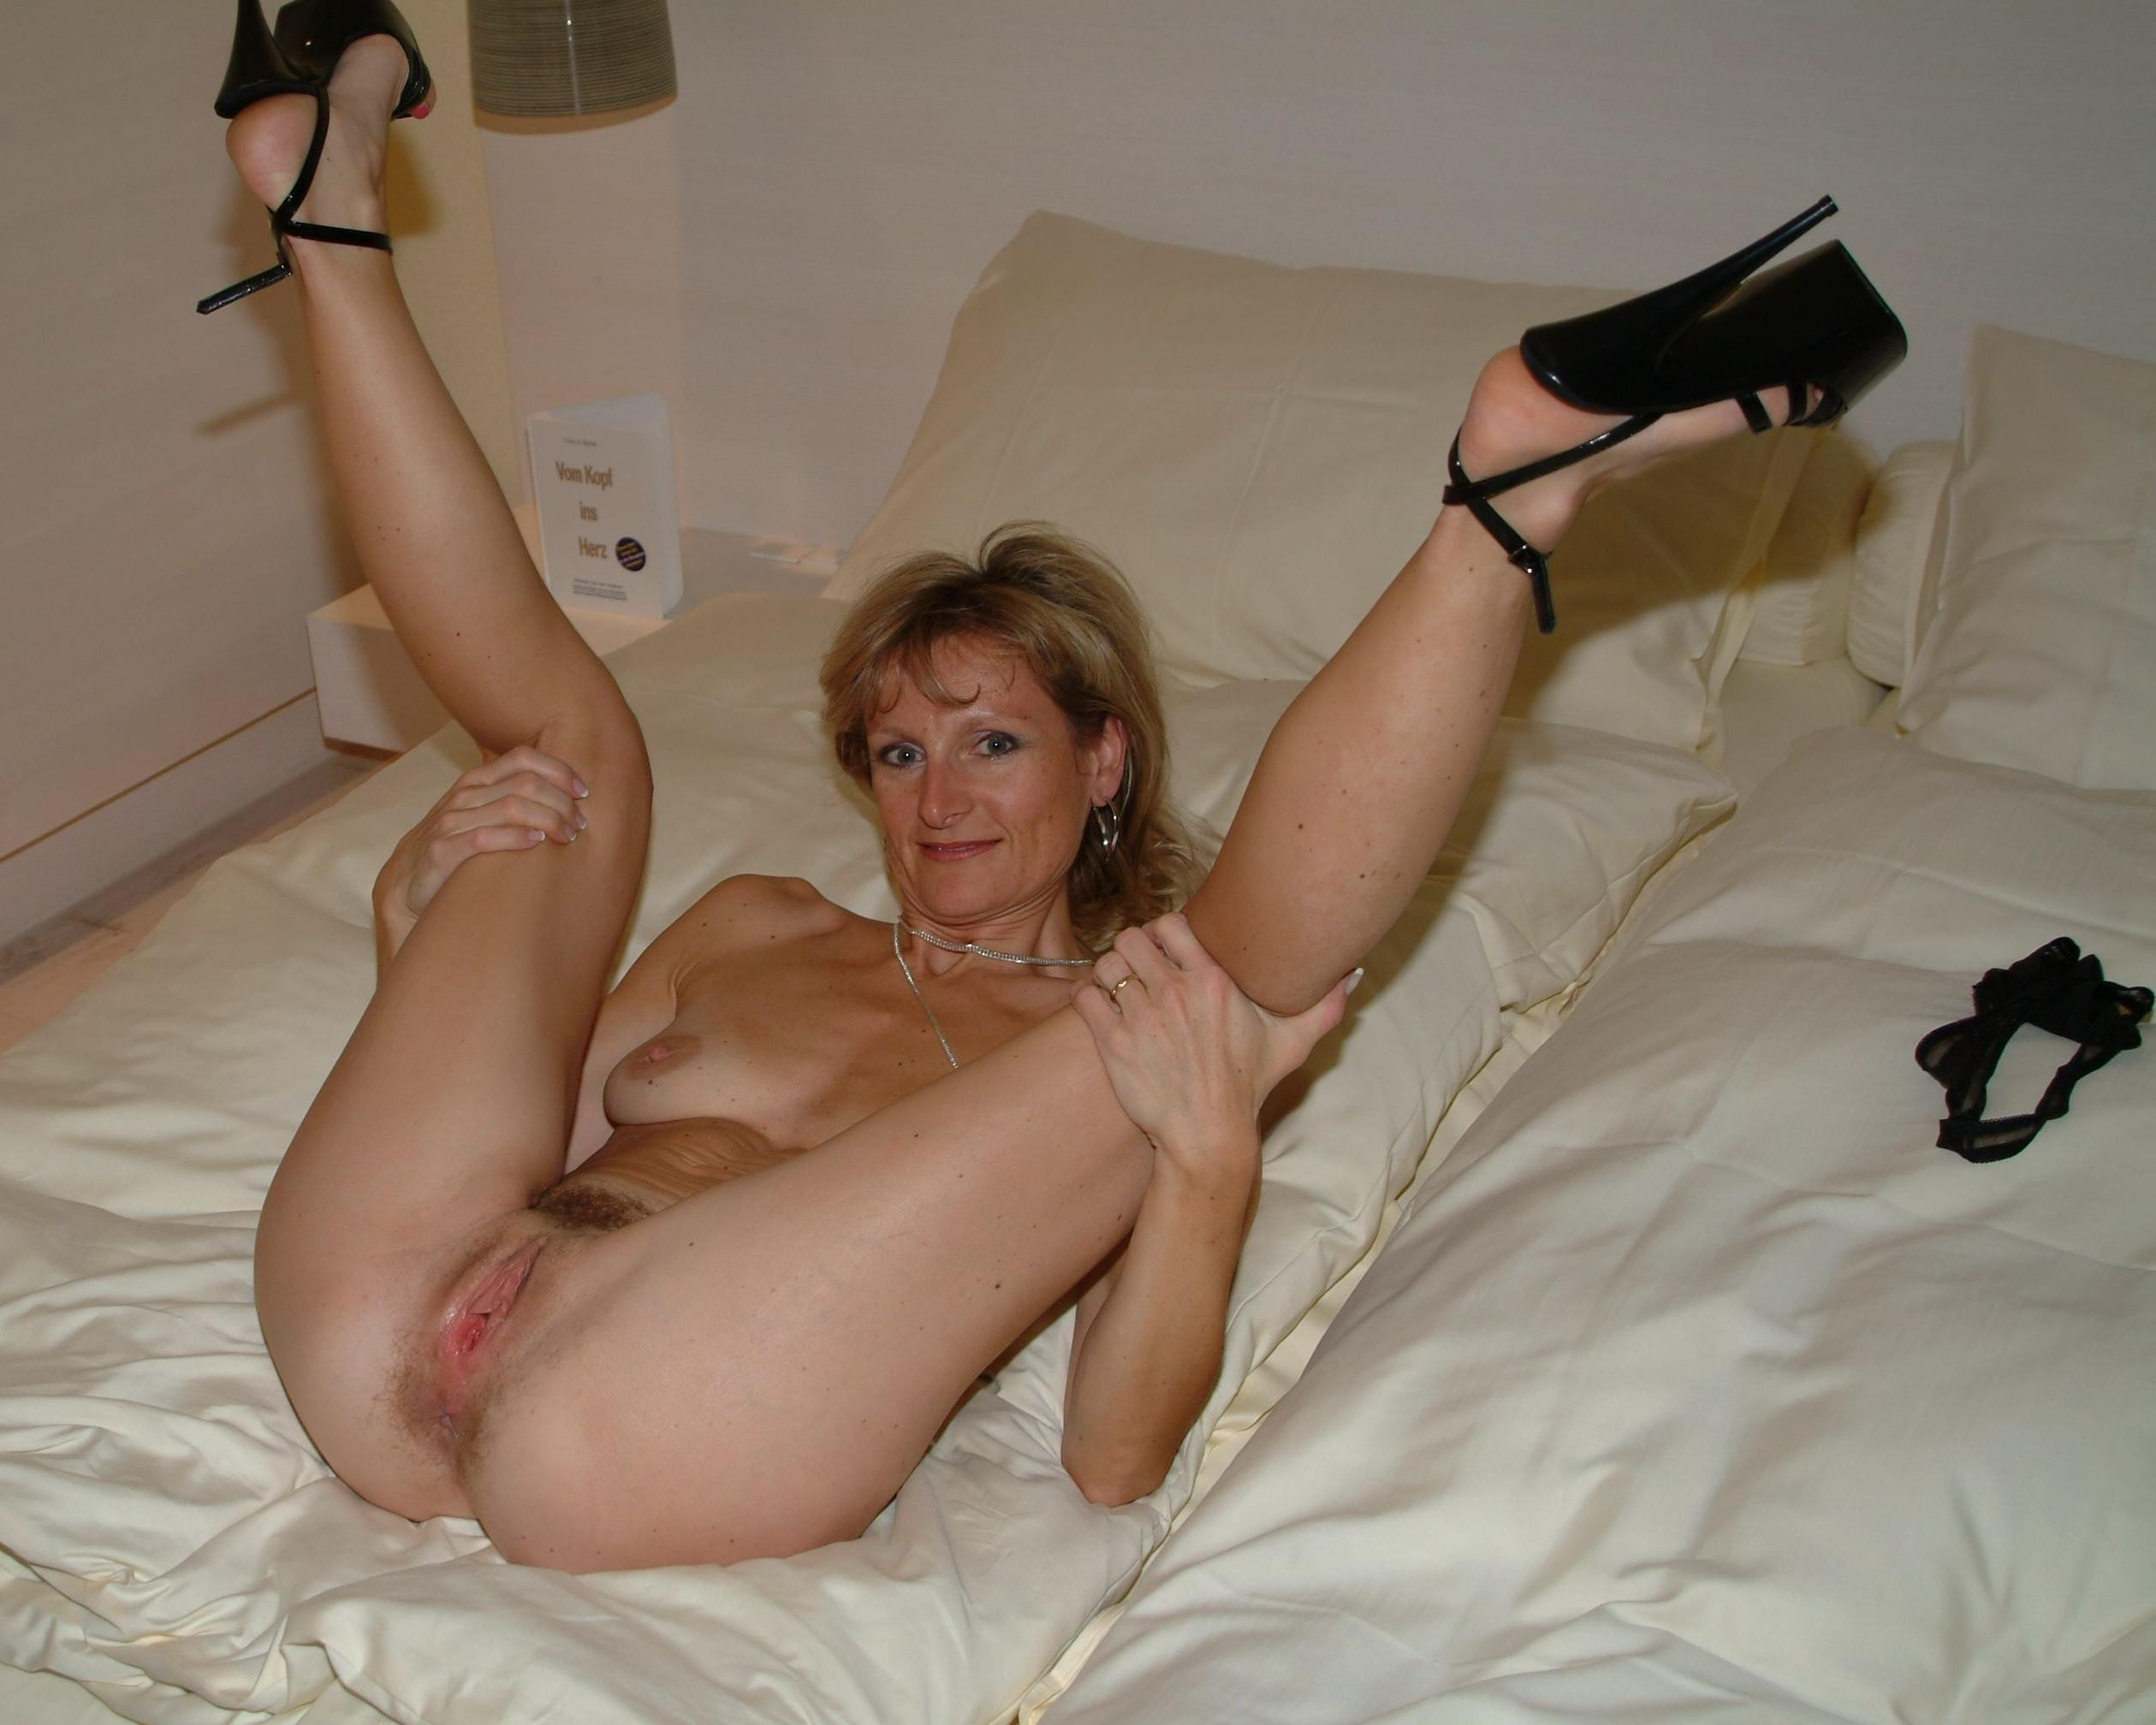 moms sexy porn amateur nude porn milf hot milfs sexy moms cougars